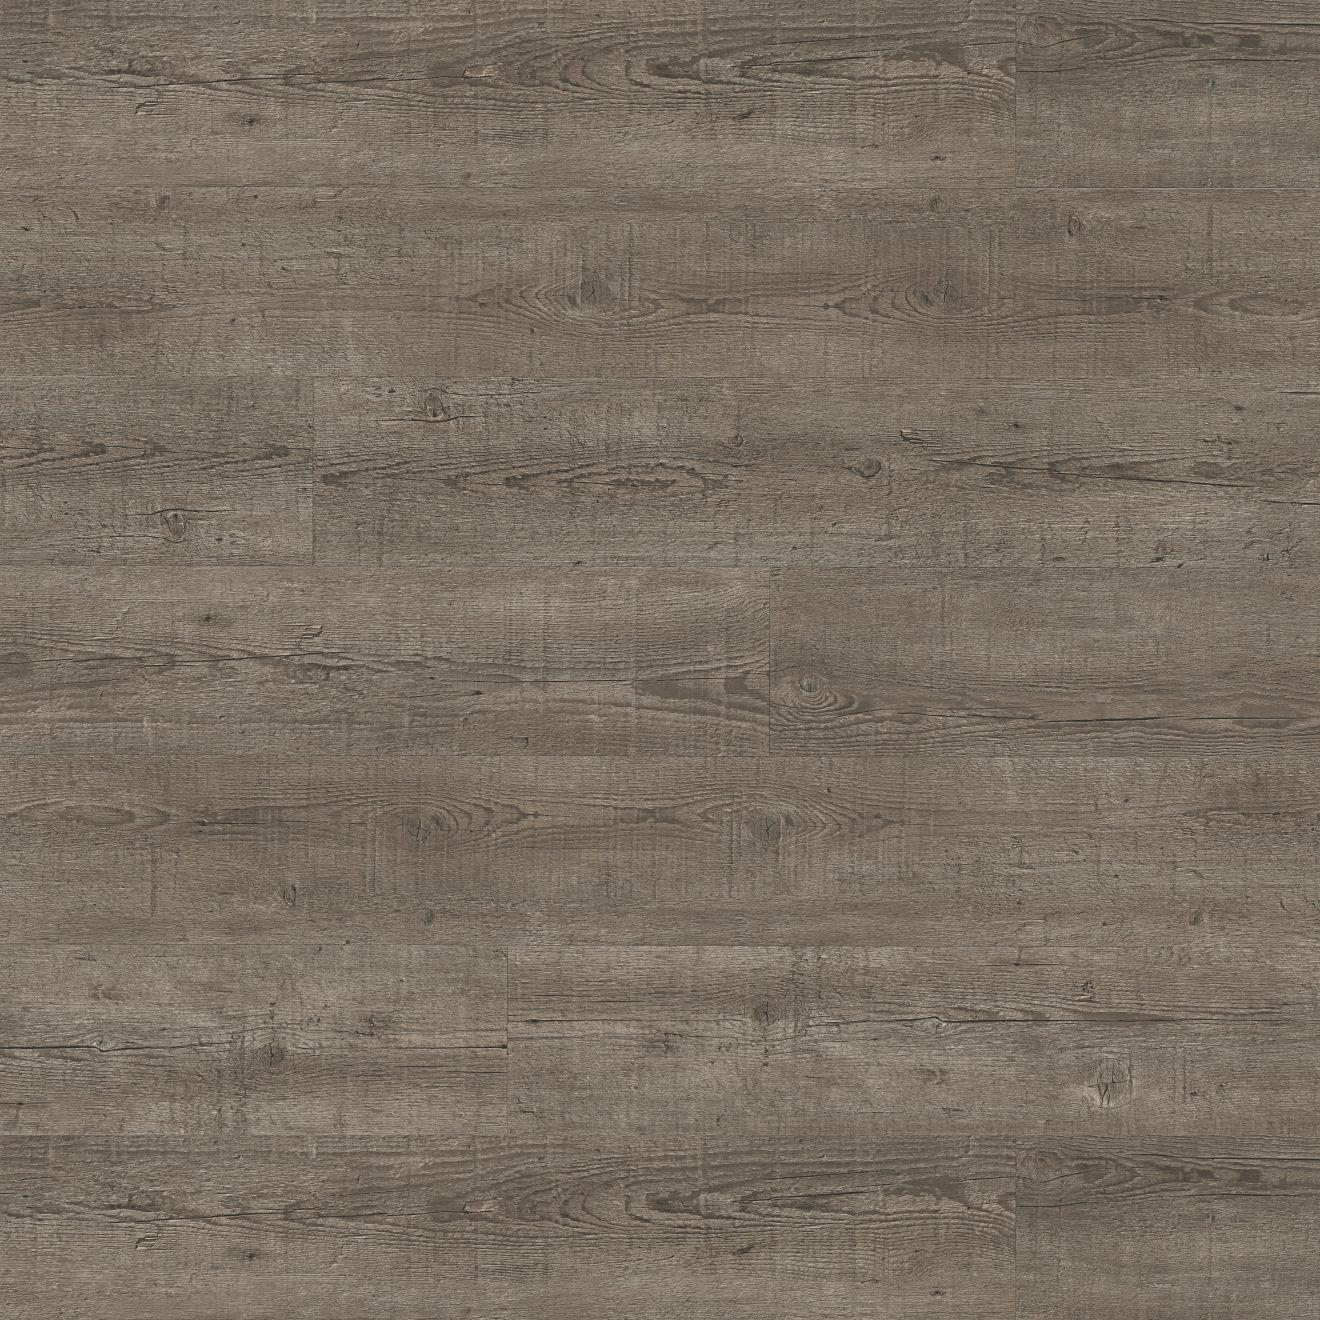 "Madera 7"" x 48"" Luxury SPC Vinyl Flooring in Barnwood Oak"